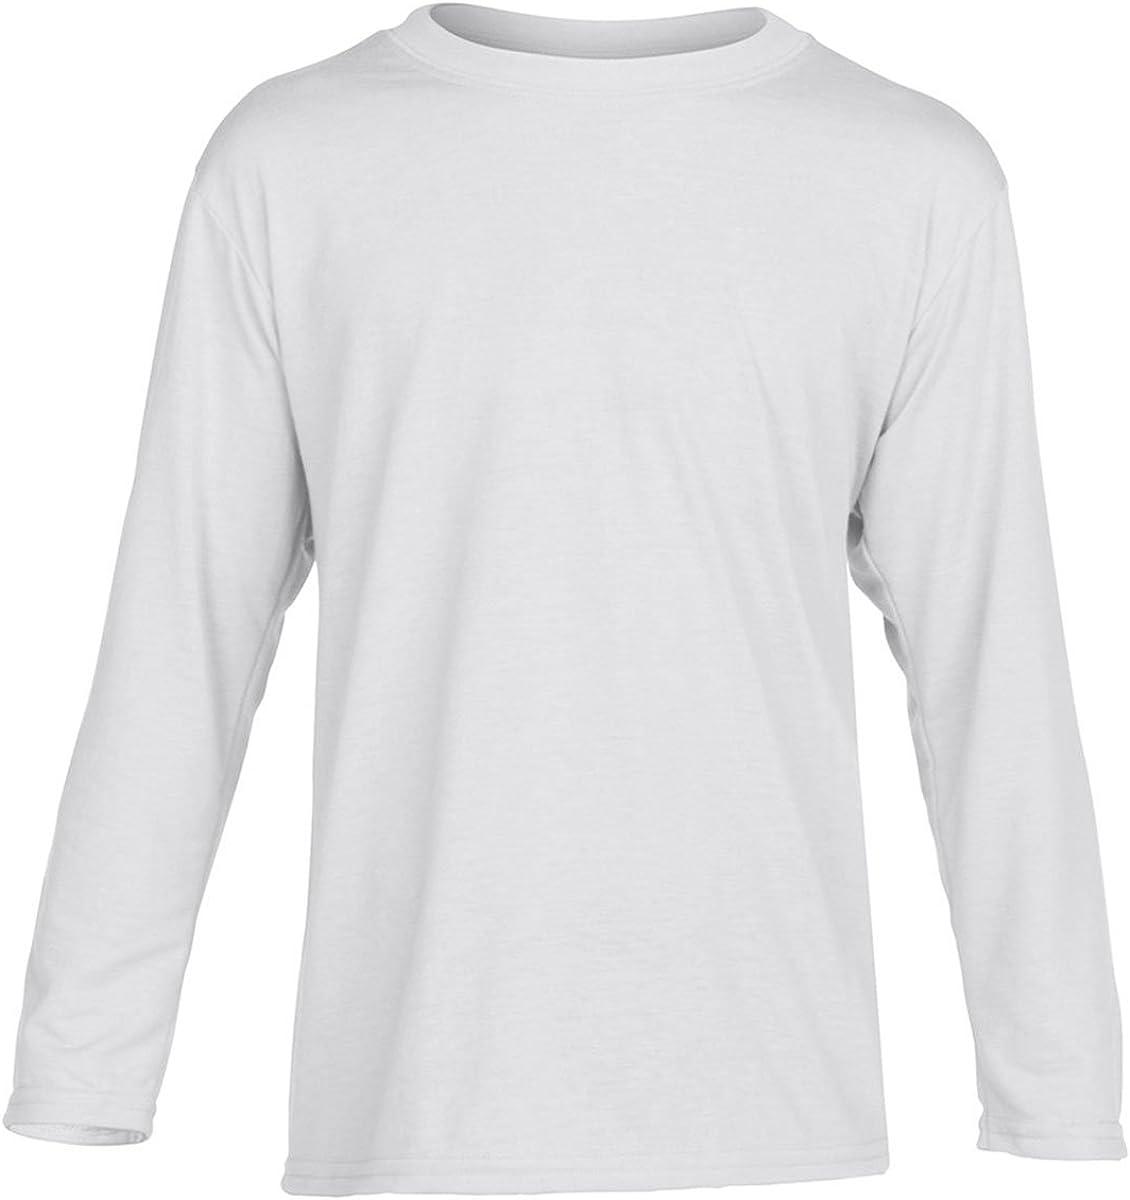 Gildan Performance Youth 4.5 oz. Long-Sleeve T-Shirt, Large, White